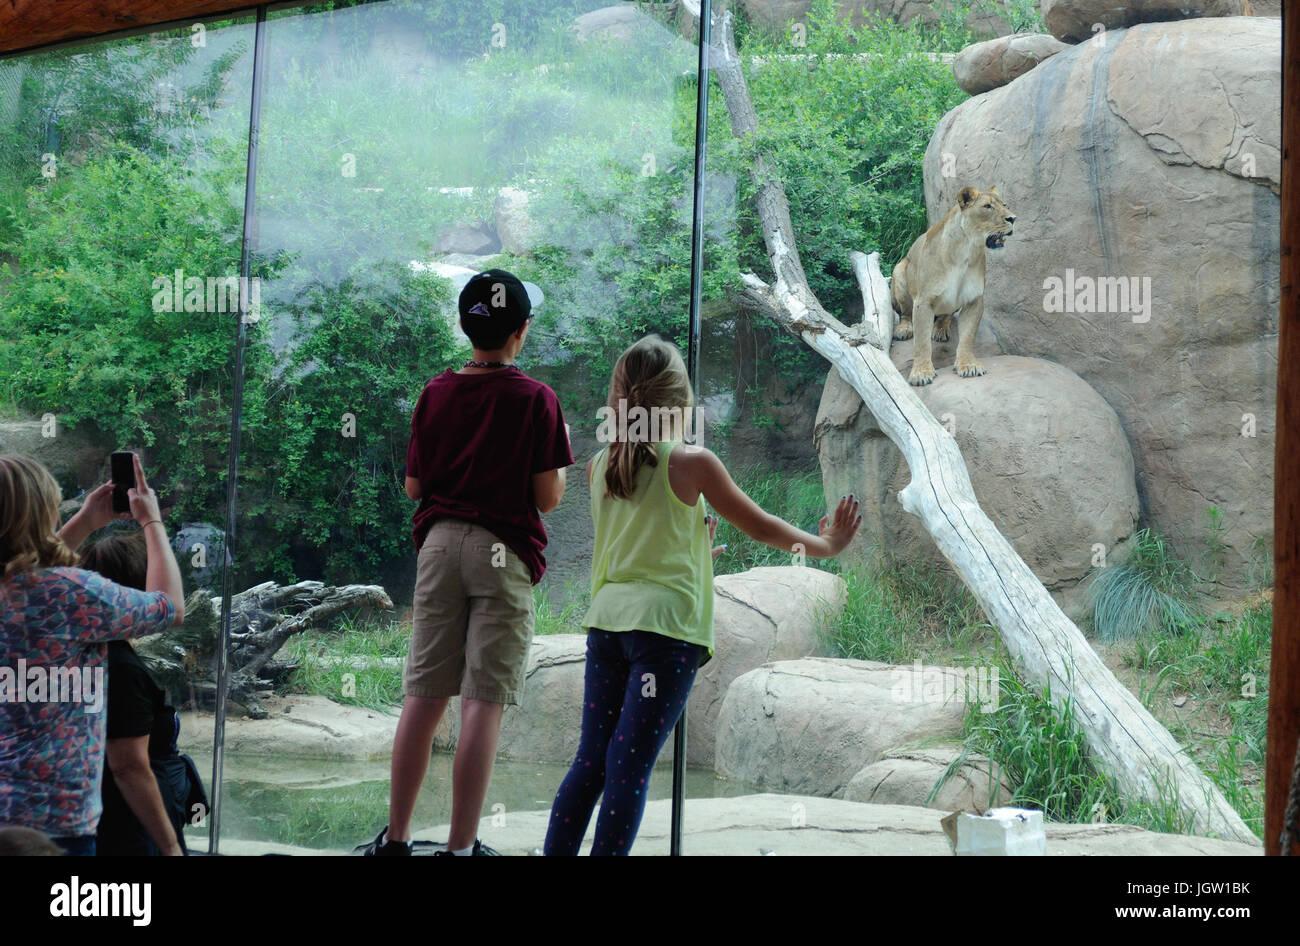 Zoo de Colorado Springs, États-Unis Banque D'Images